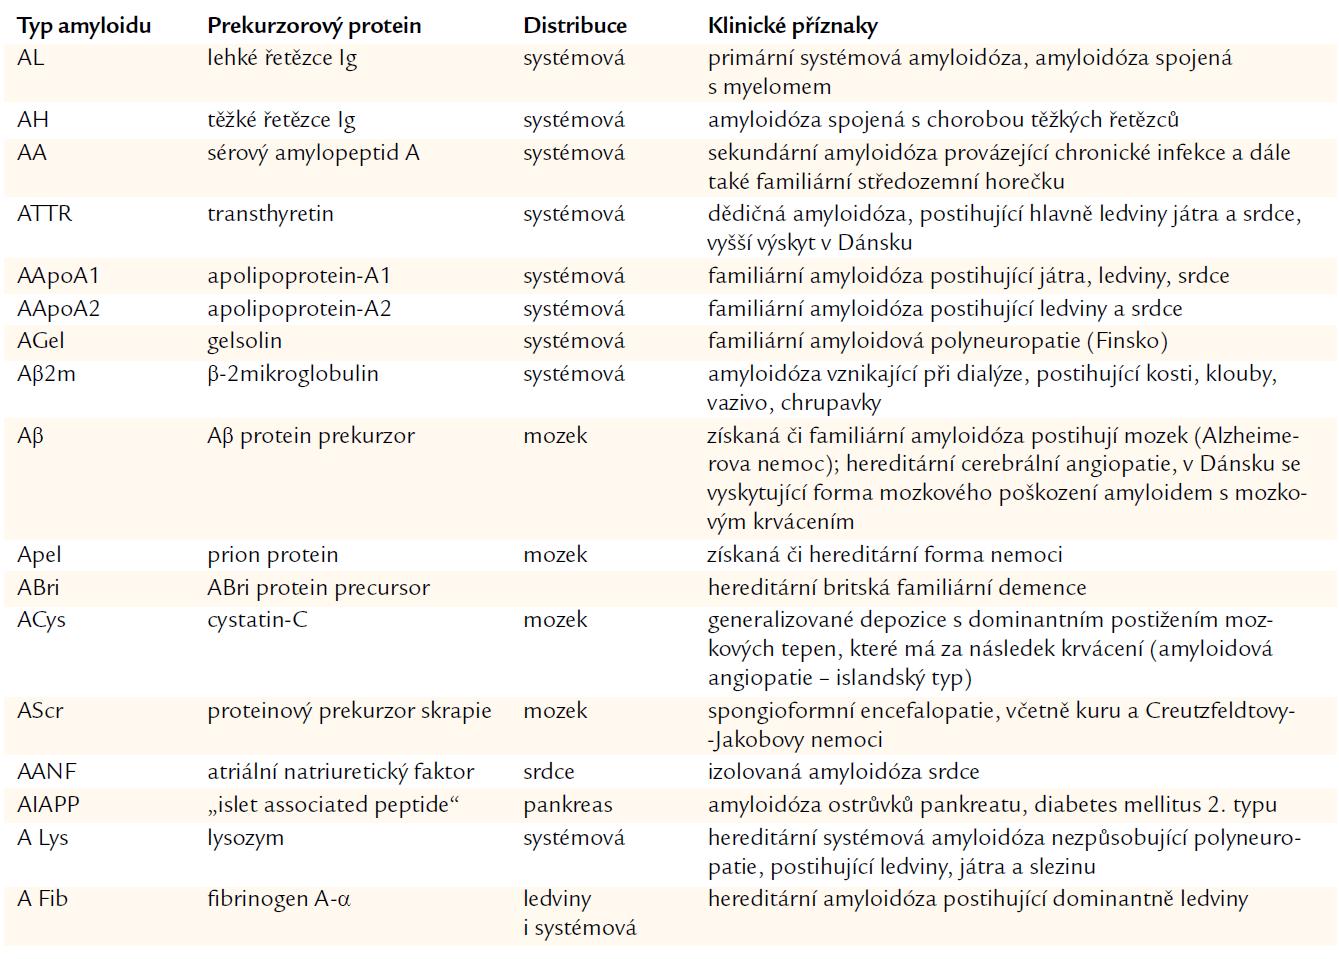 Chemická klasifikace amyloidóz. WHO- IUIS nomenclature subcomittee: Nomenclature of amyloid and amyloidoses [48].